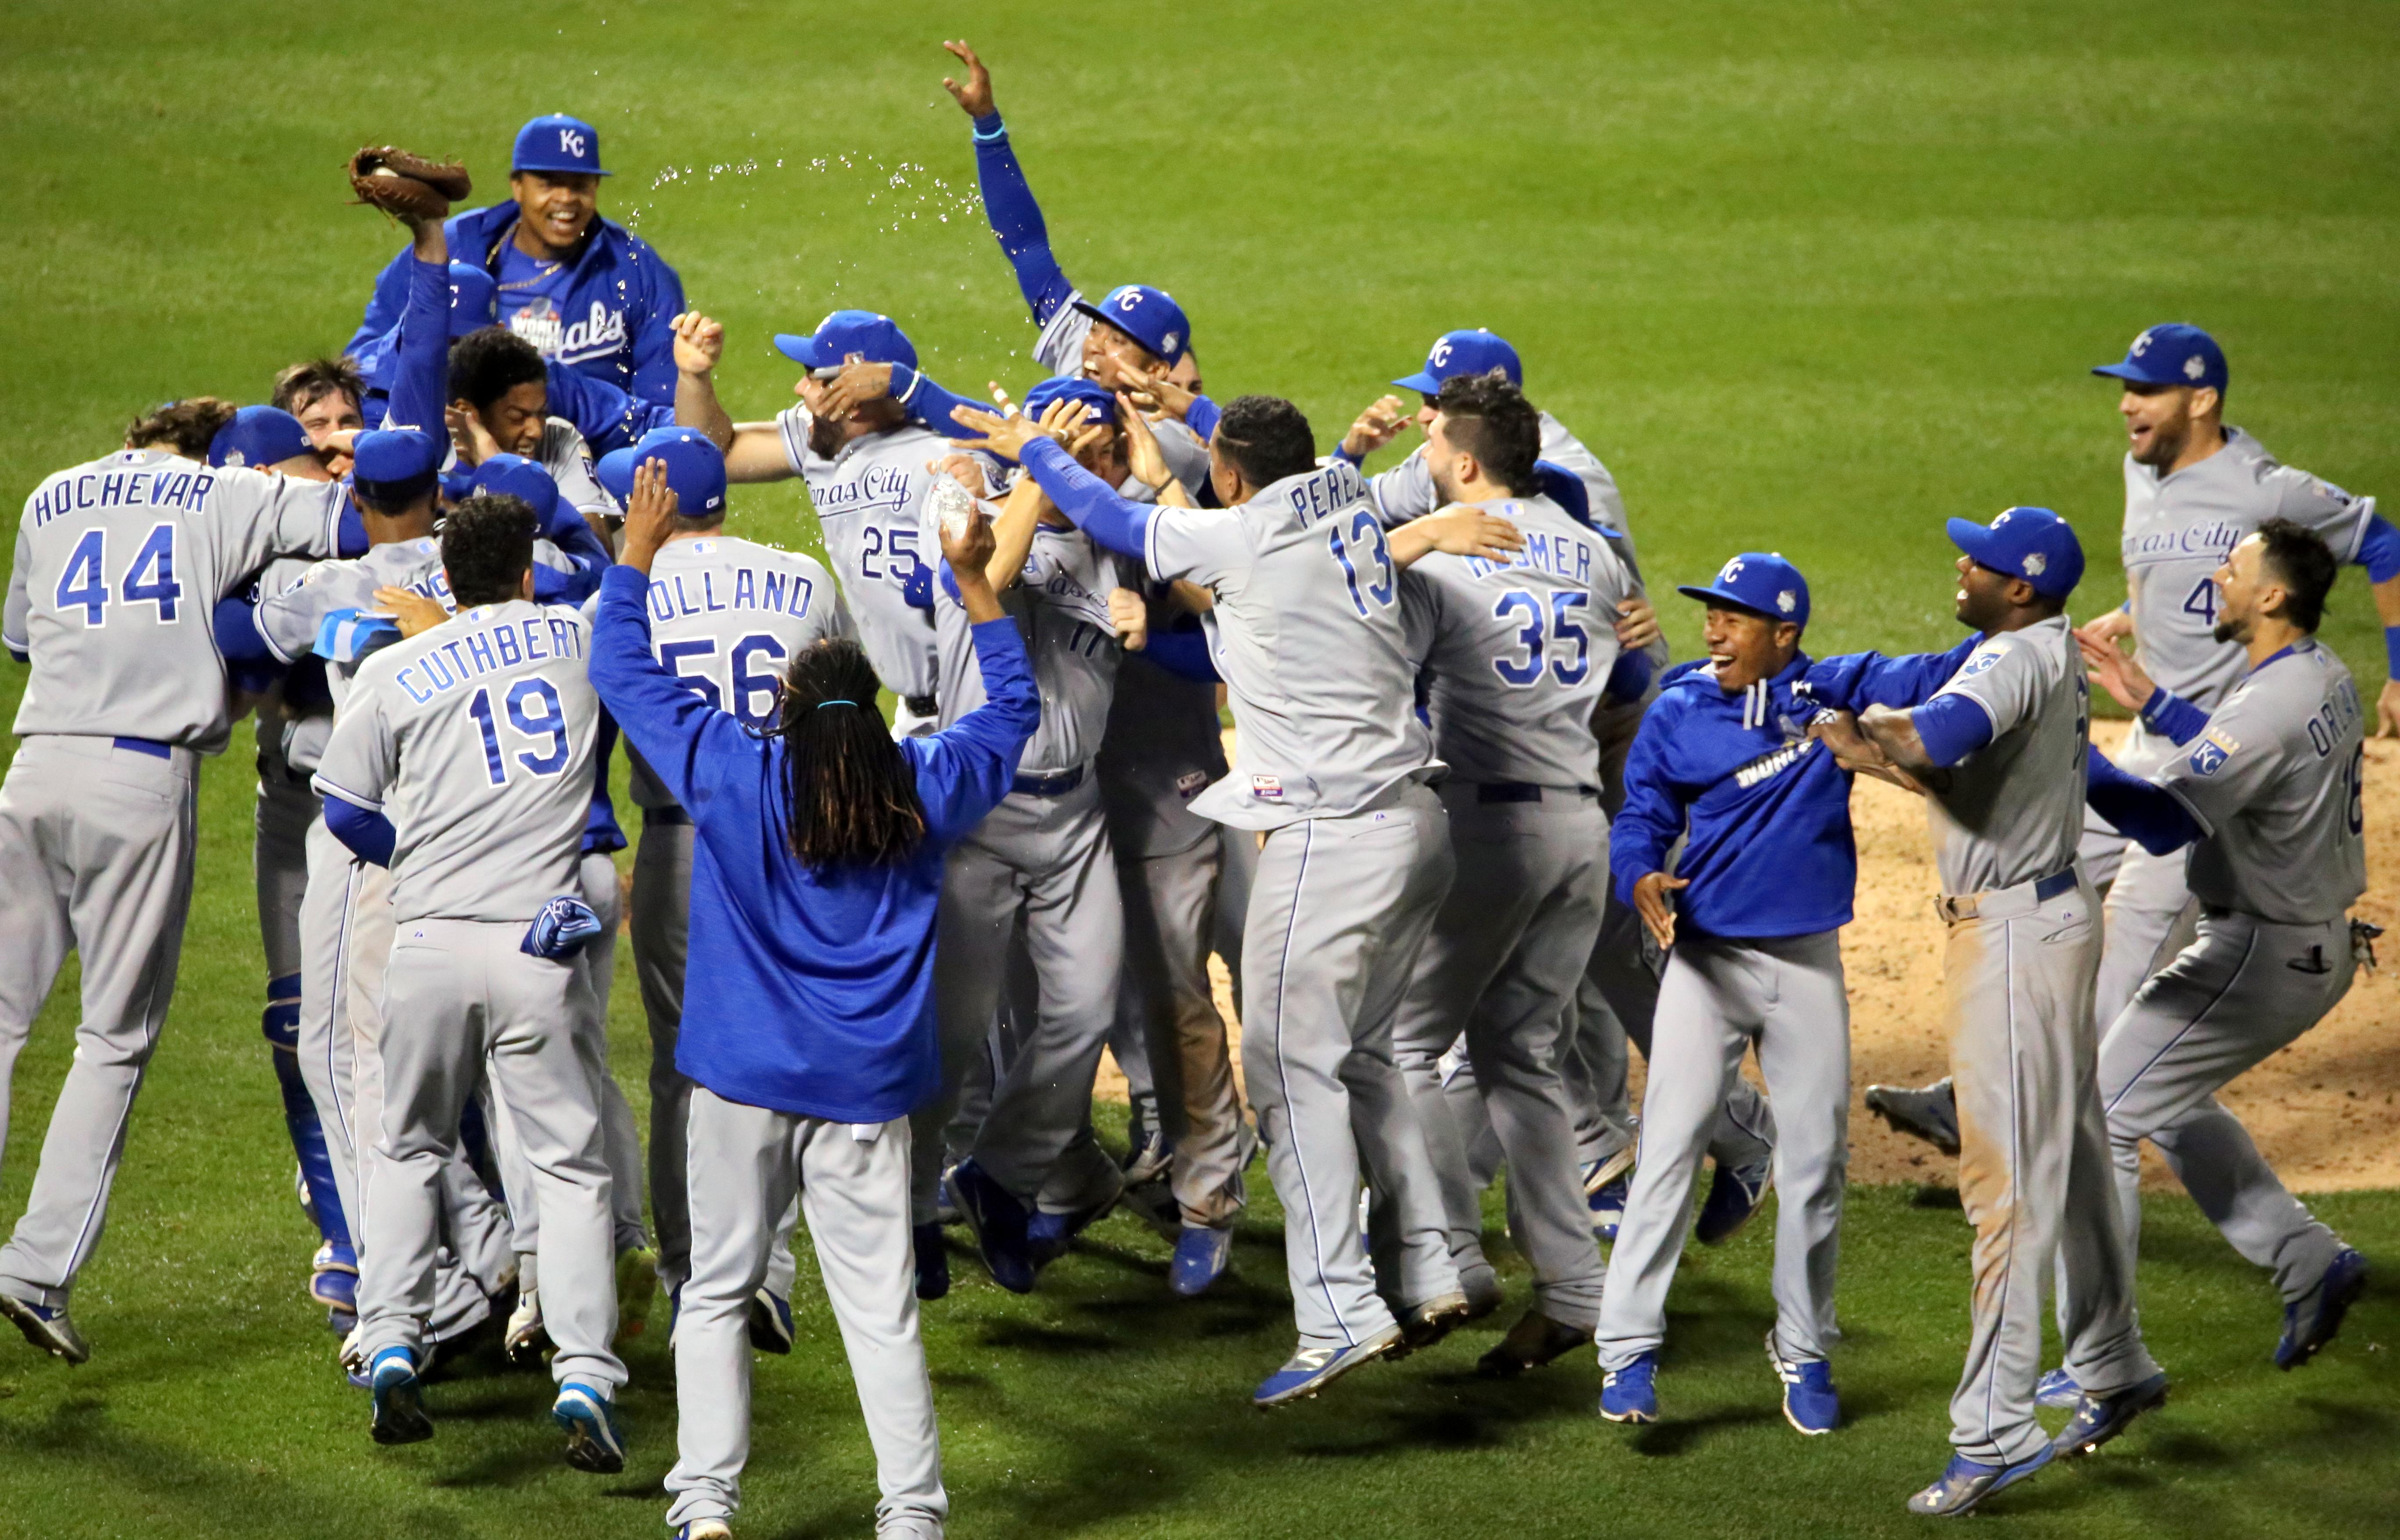 File:Royals win 2015 -WorldSeries (22744046262) jpg